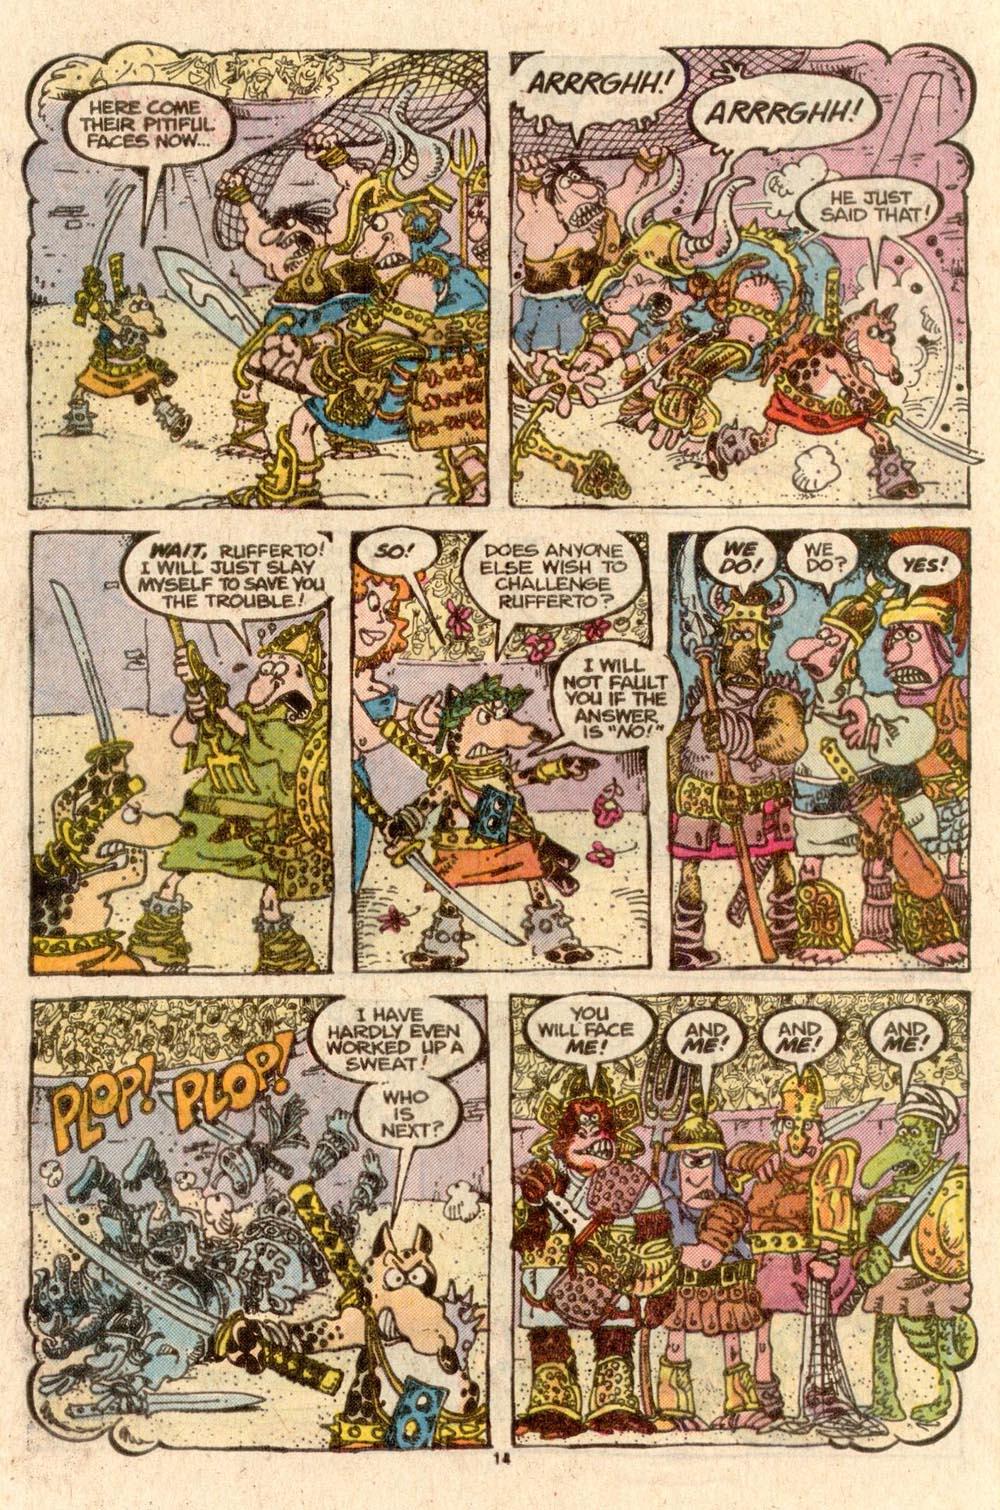 Read online Sergio Aragonés Groo the Wanderer comic -  Issue #44 - 14